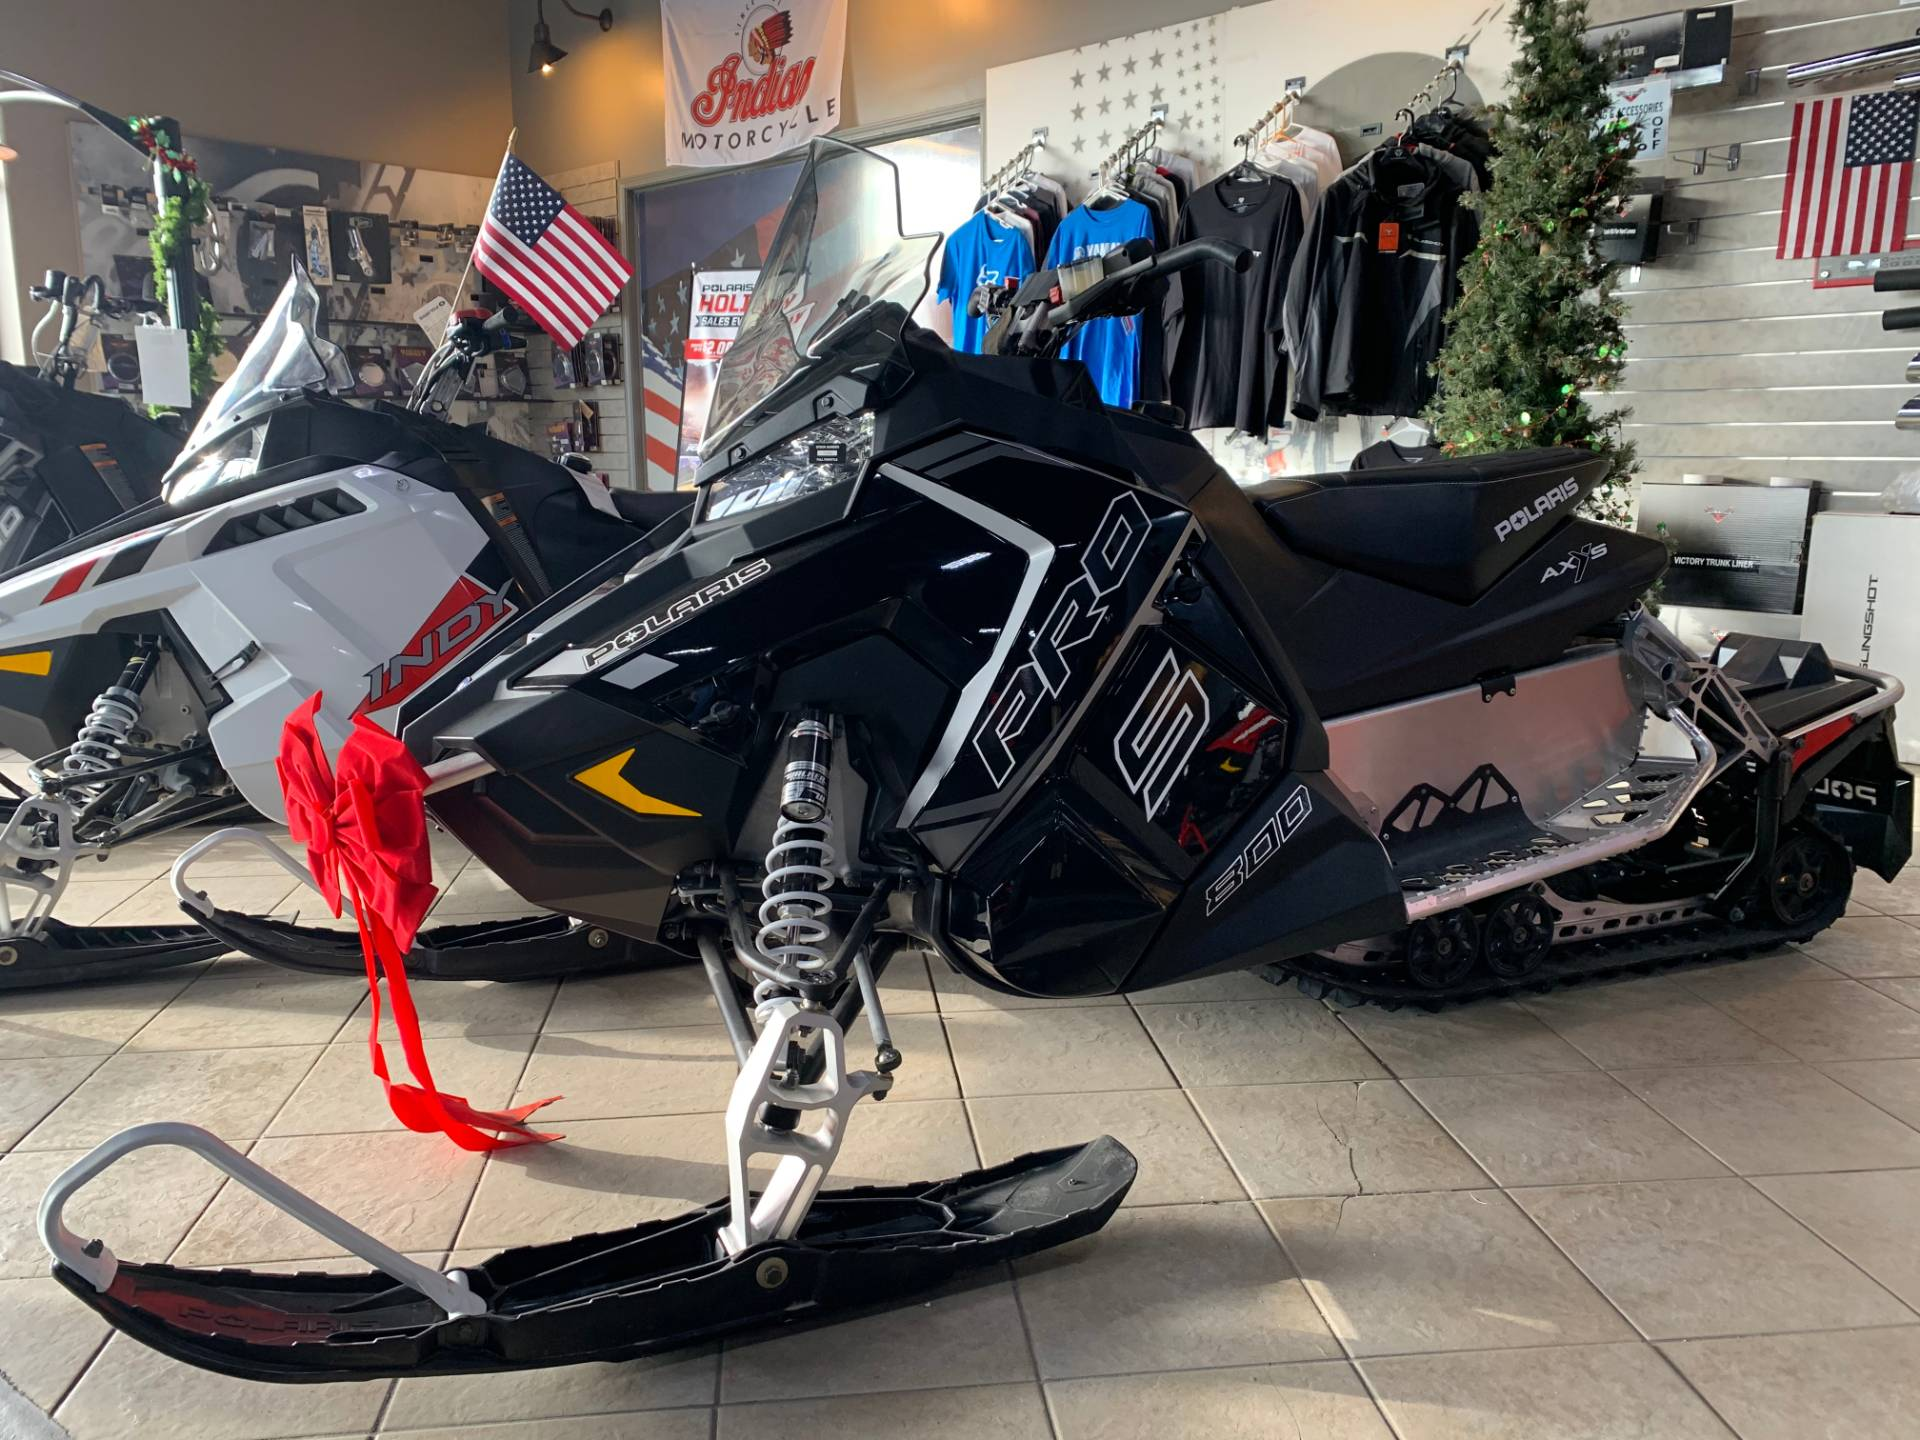 2018 Polaris 800 RUSH PRO-S in Dimondale, Michigan